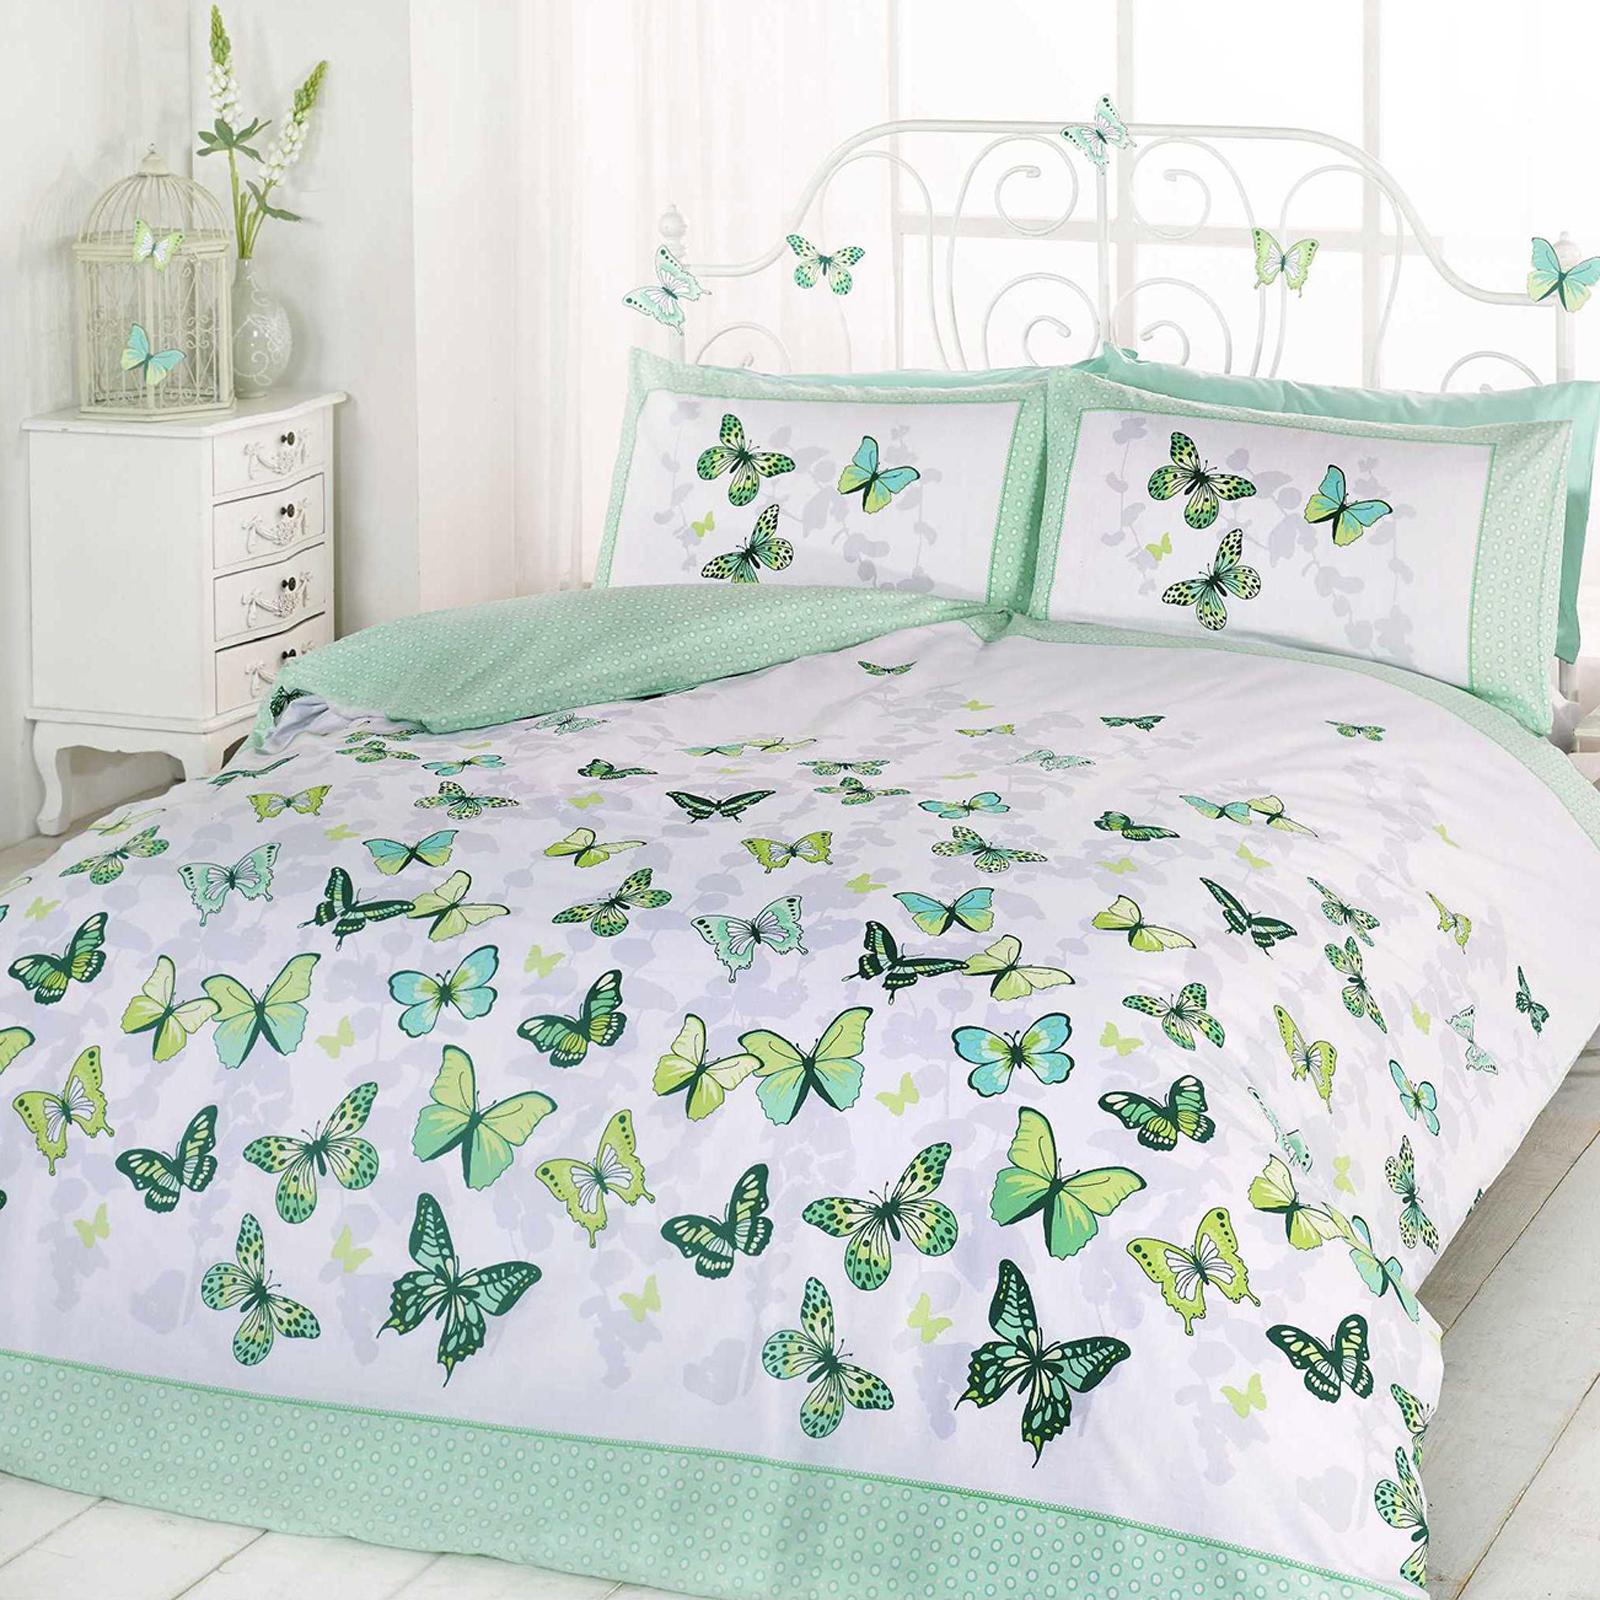 Girls Butterfly Bedding Reversible Polka Dot Cotton Rich